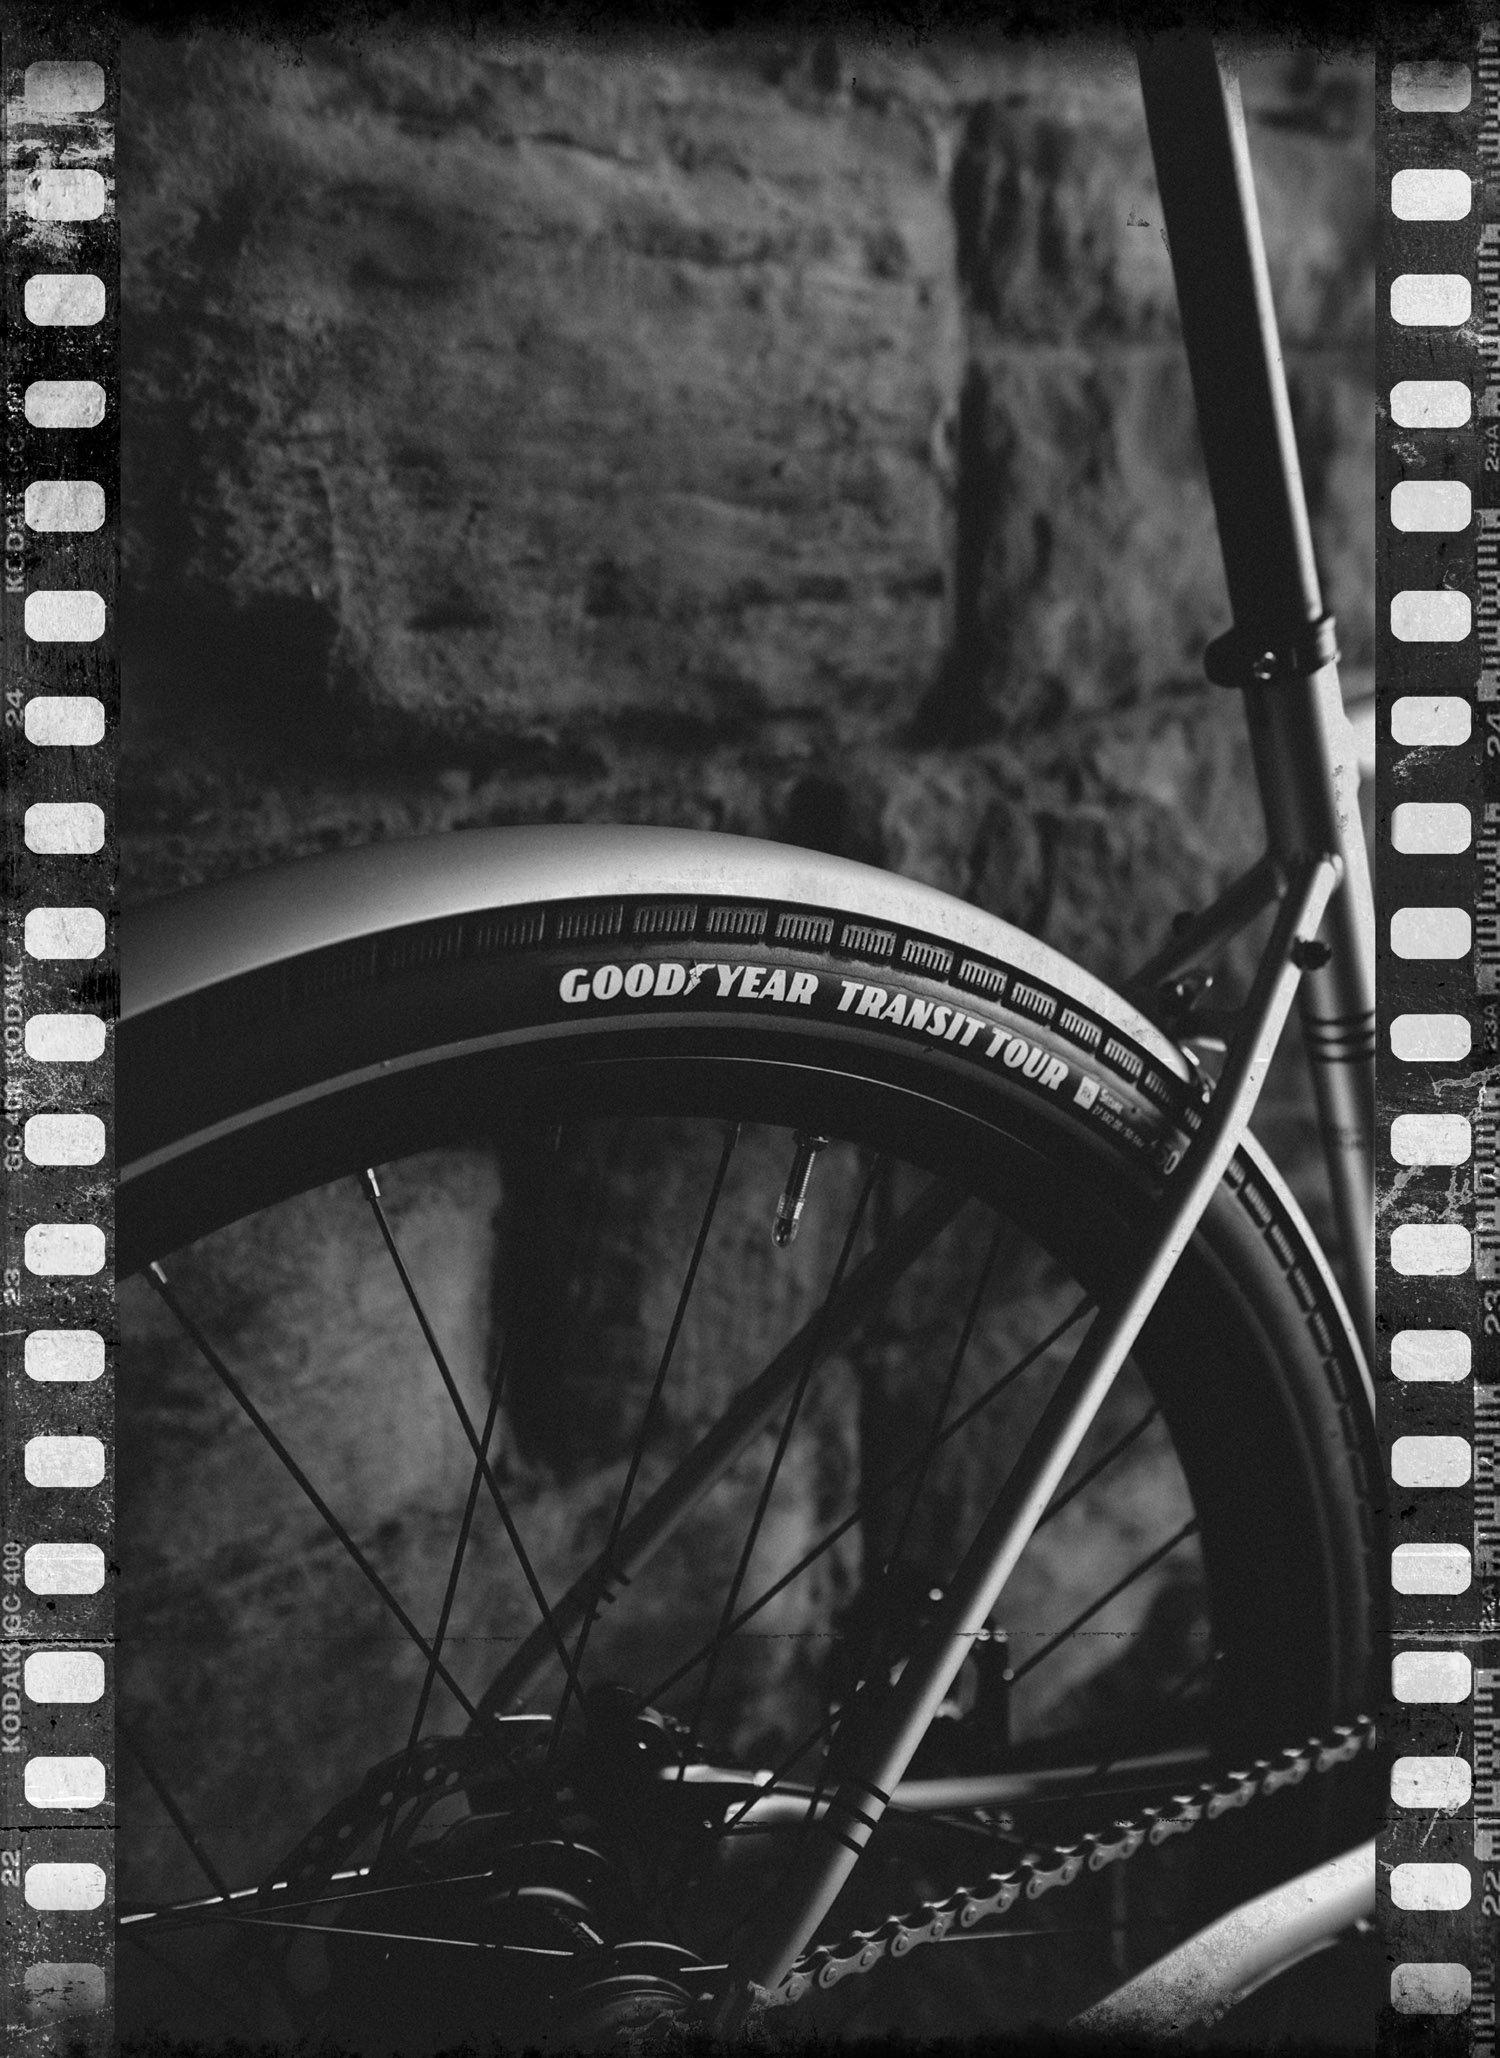 Mono photo of Goodyear Transit Tour bike tire